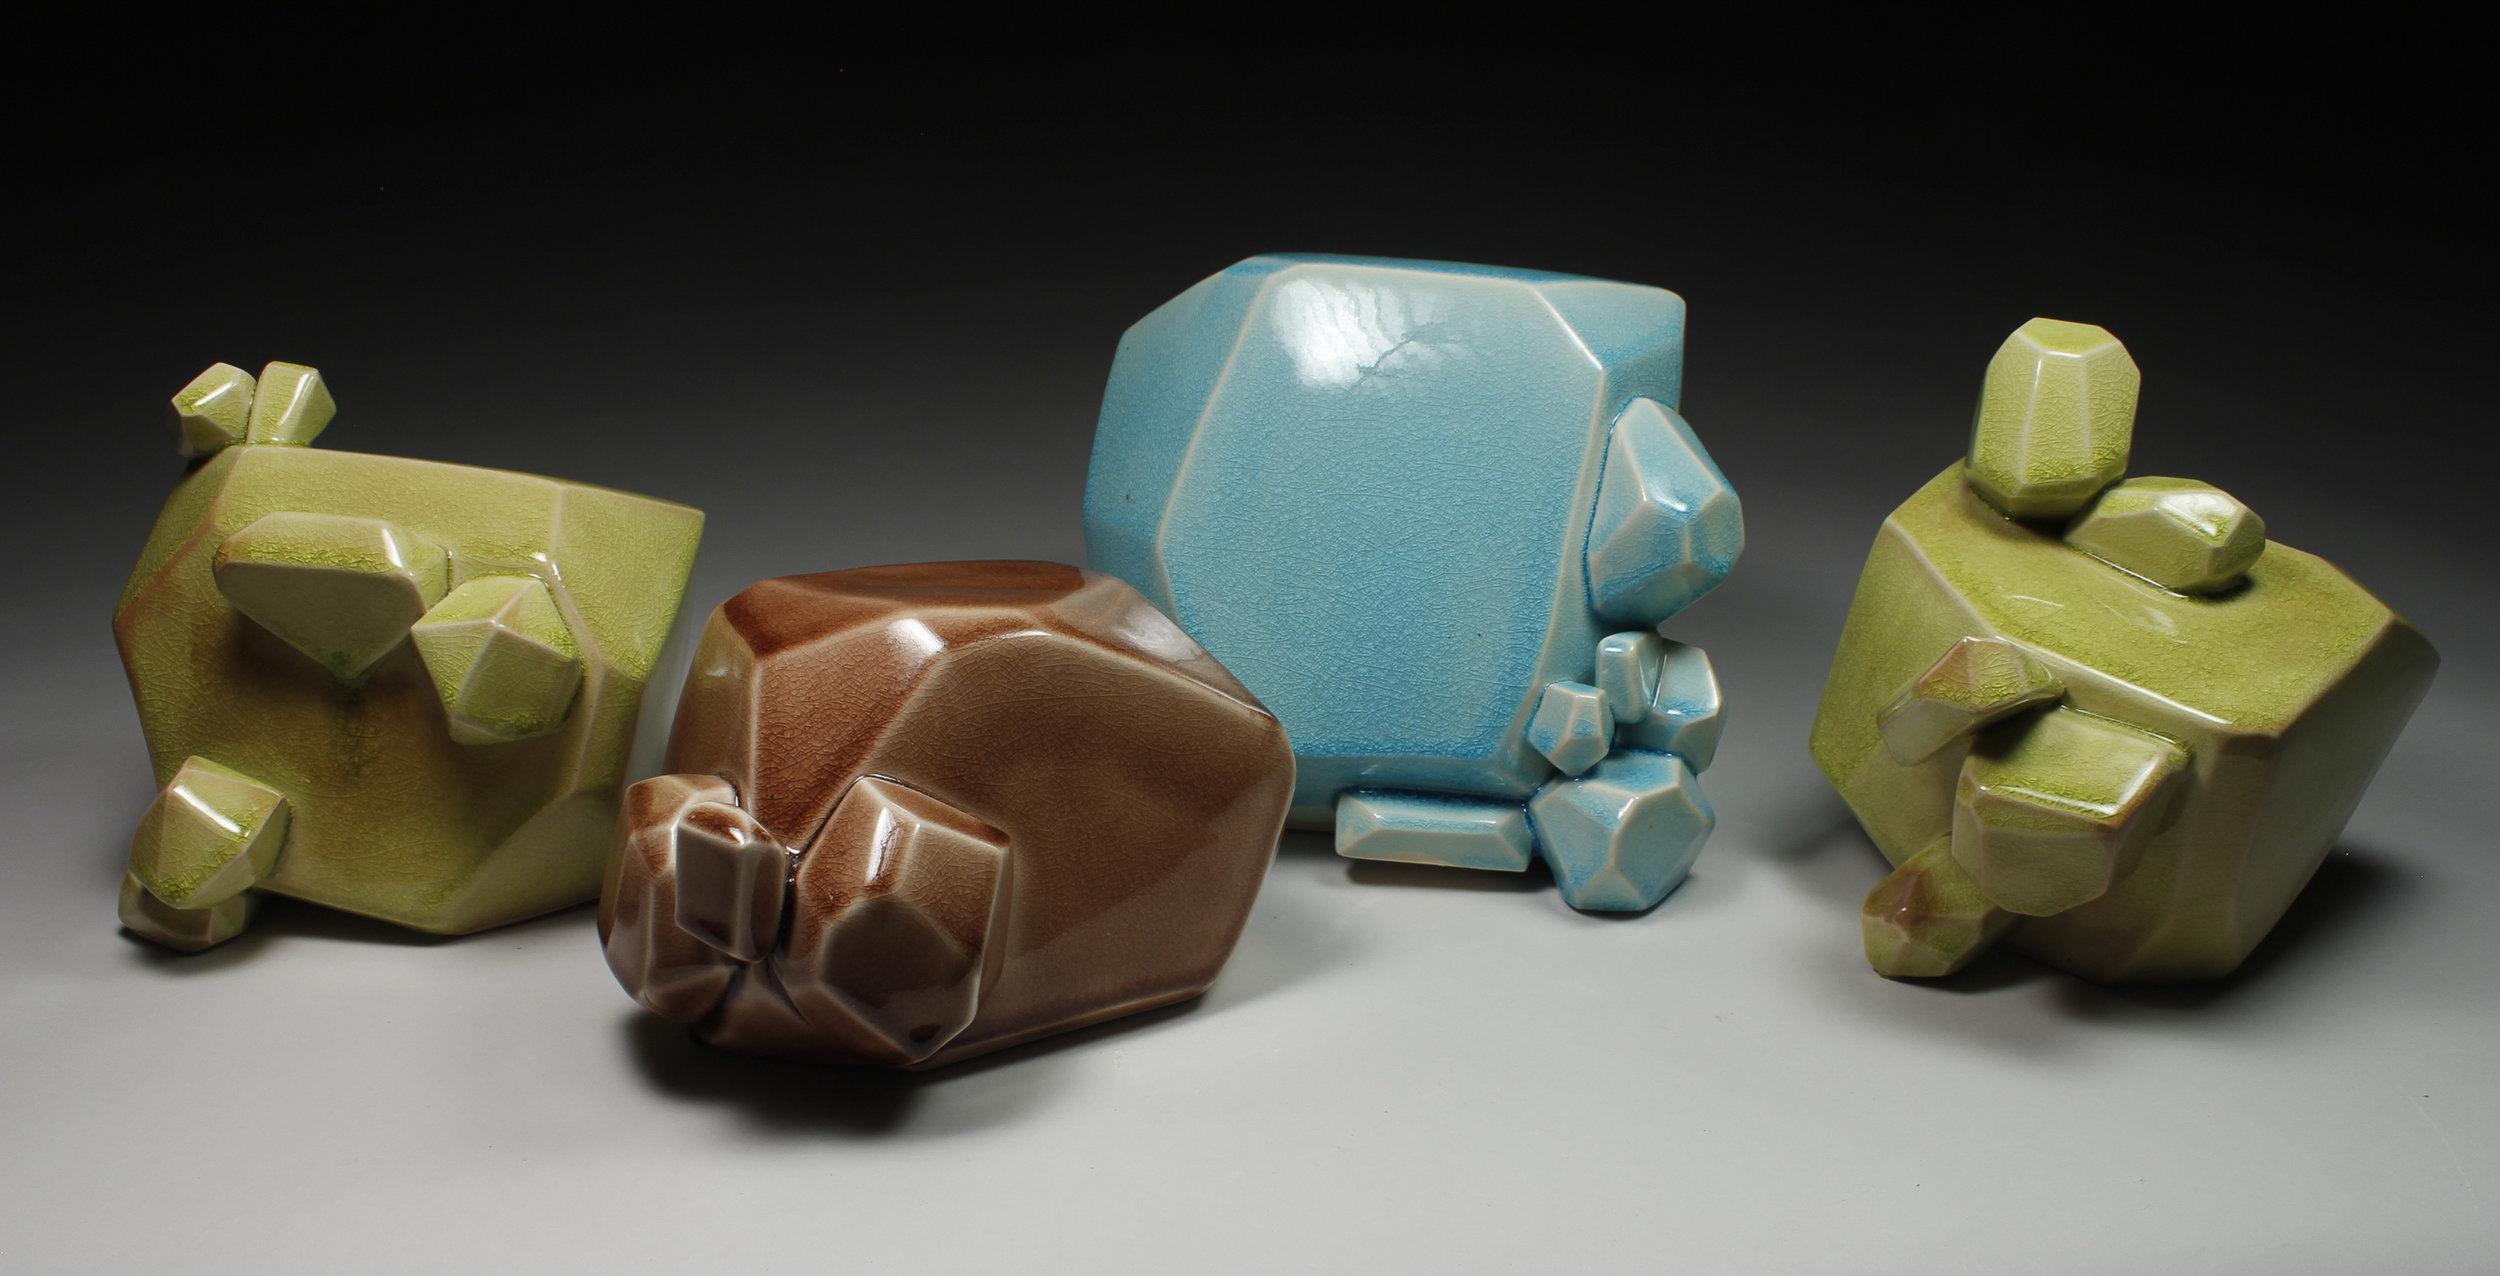 Foursome of Bubble Chunks (Chartreause 2, Maroon 1, Aqua 1, Chartreause 1), 2017